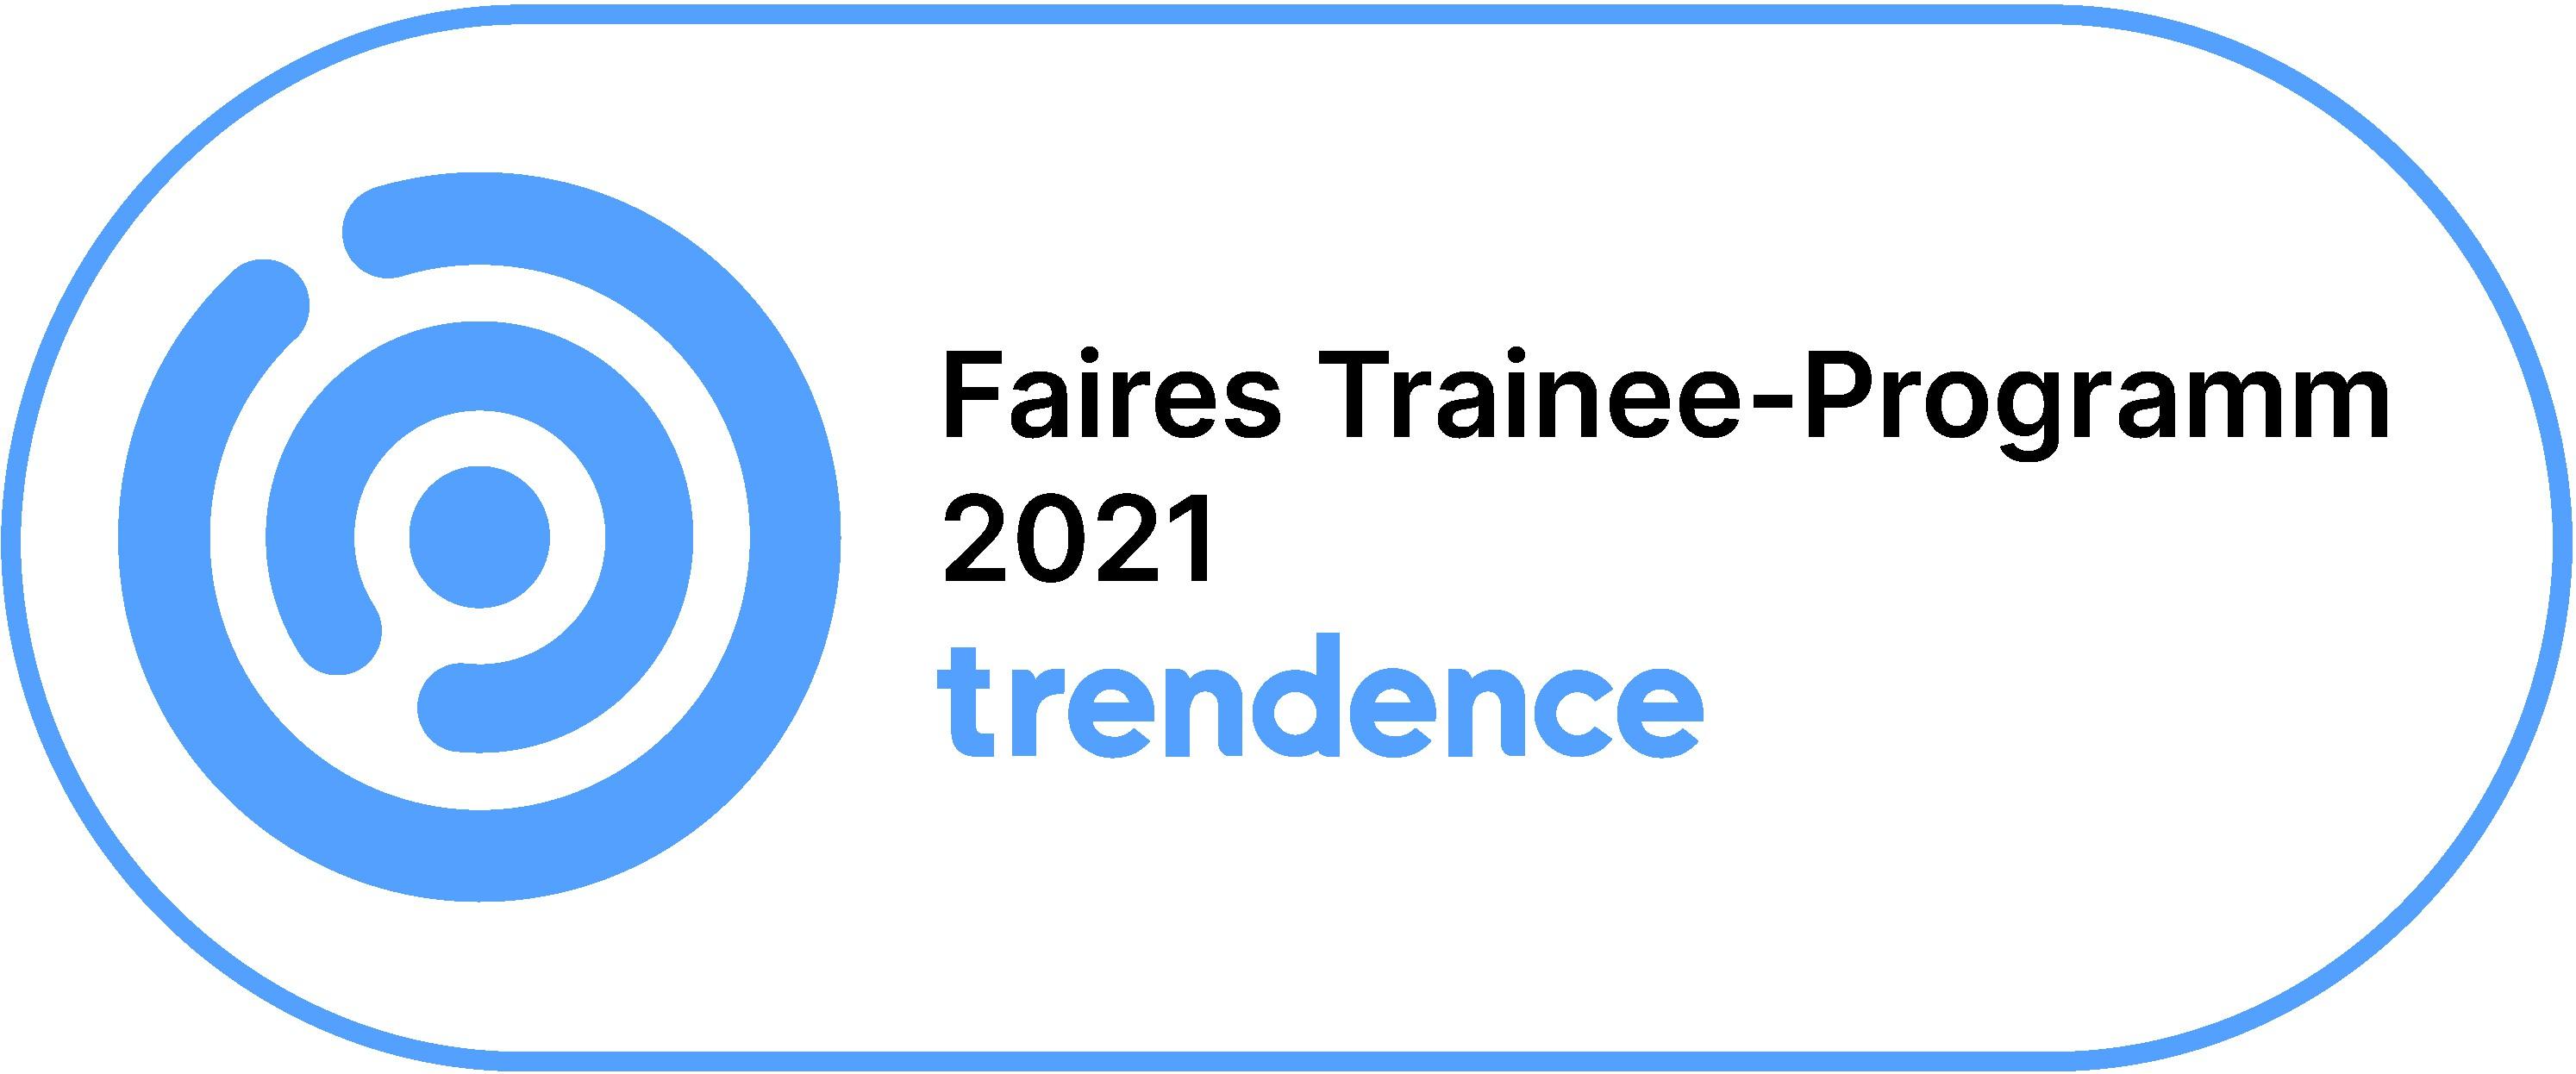 Award: Faires Trainee-Programm 2021